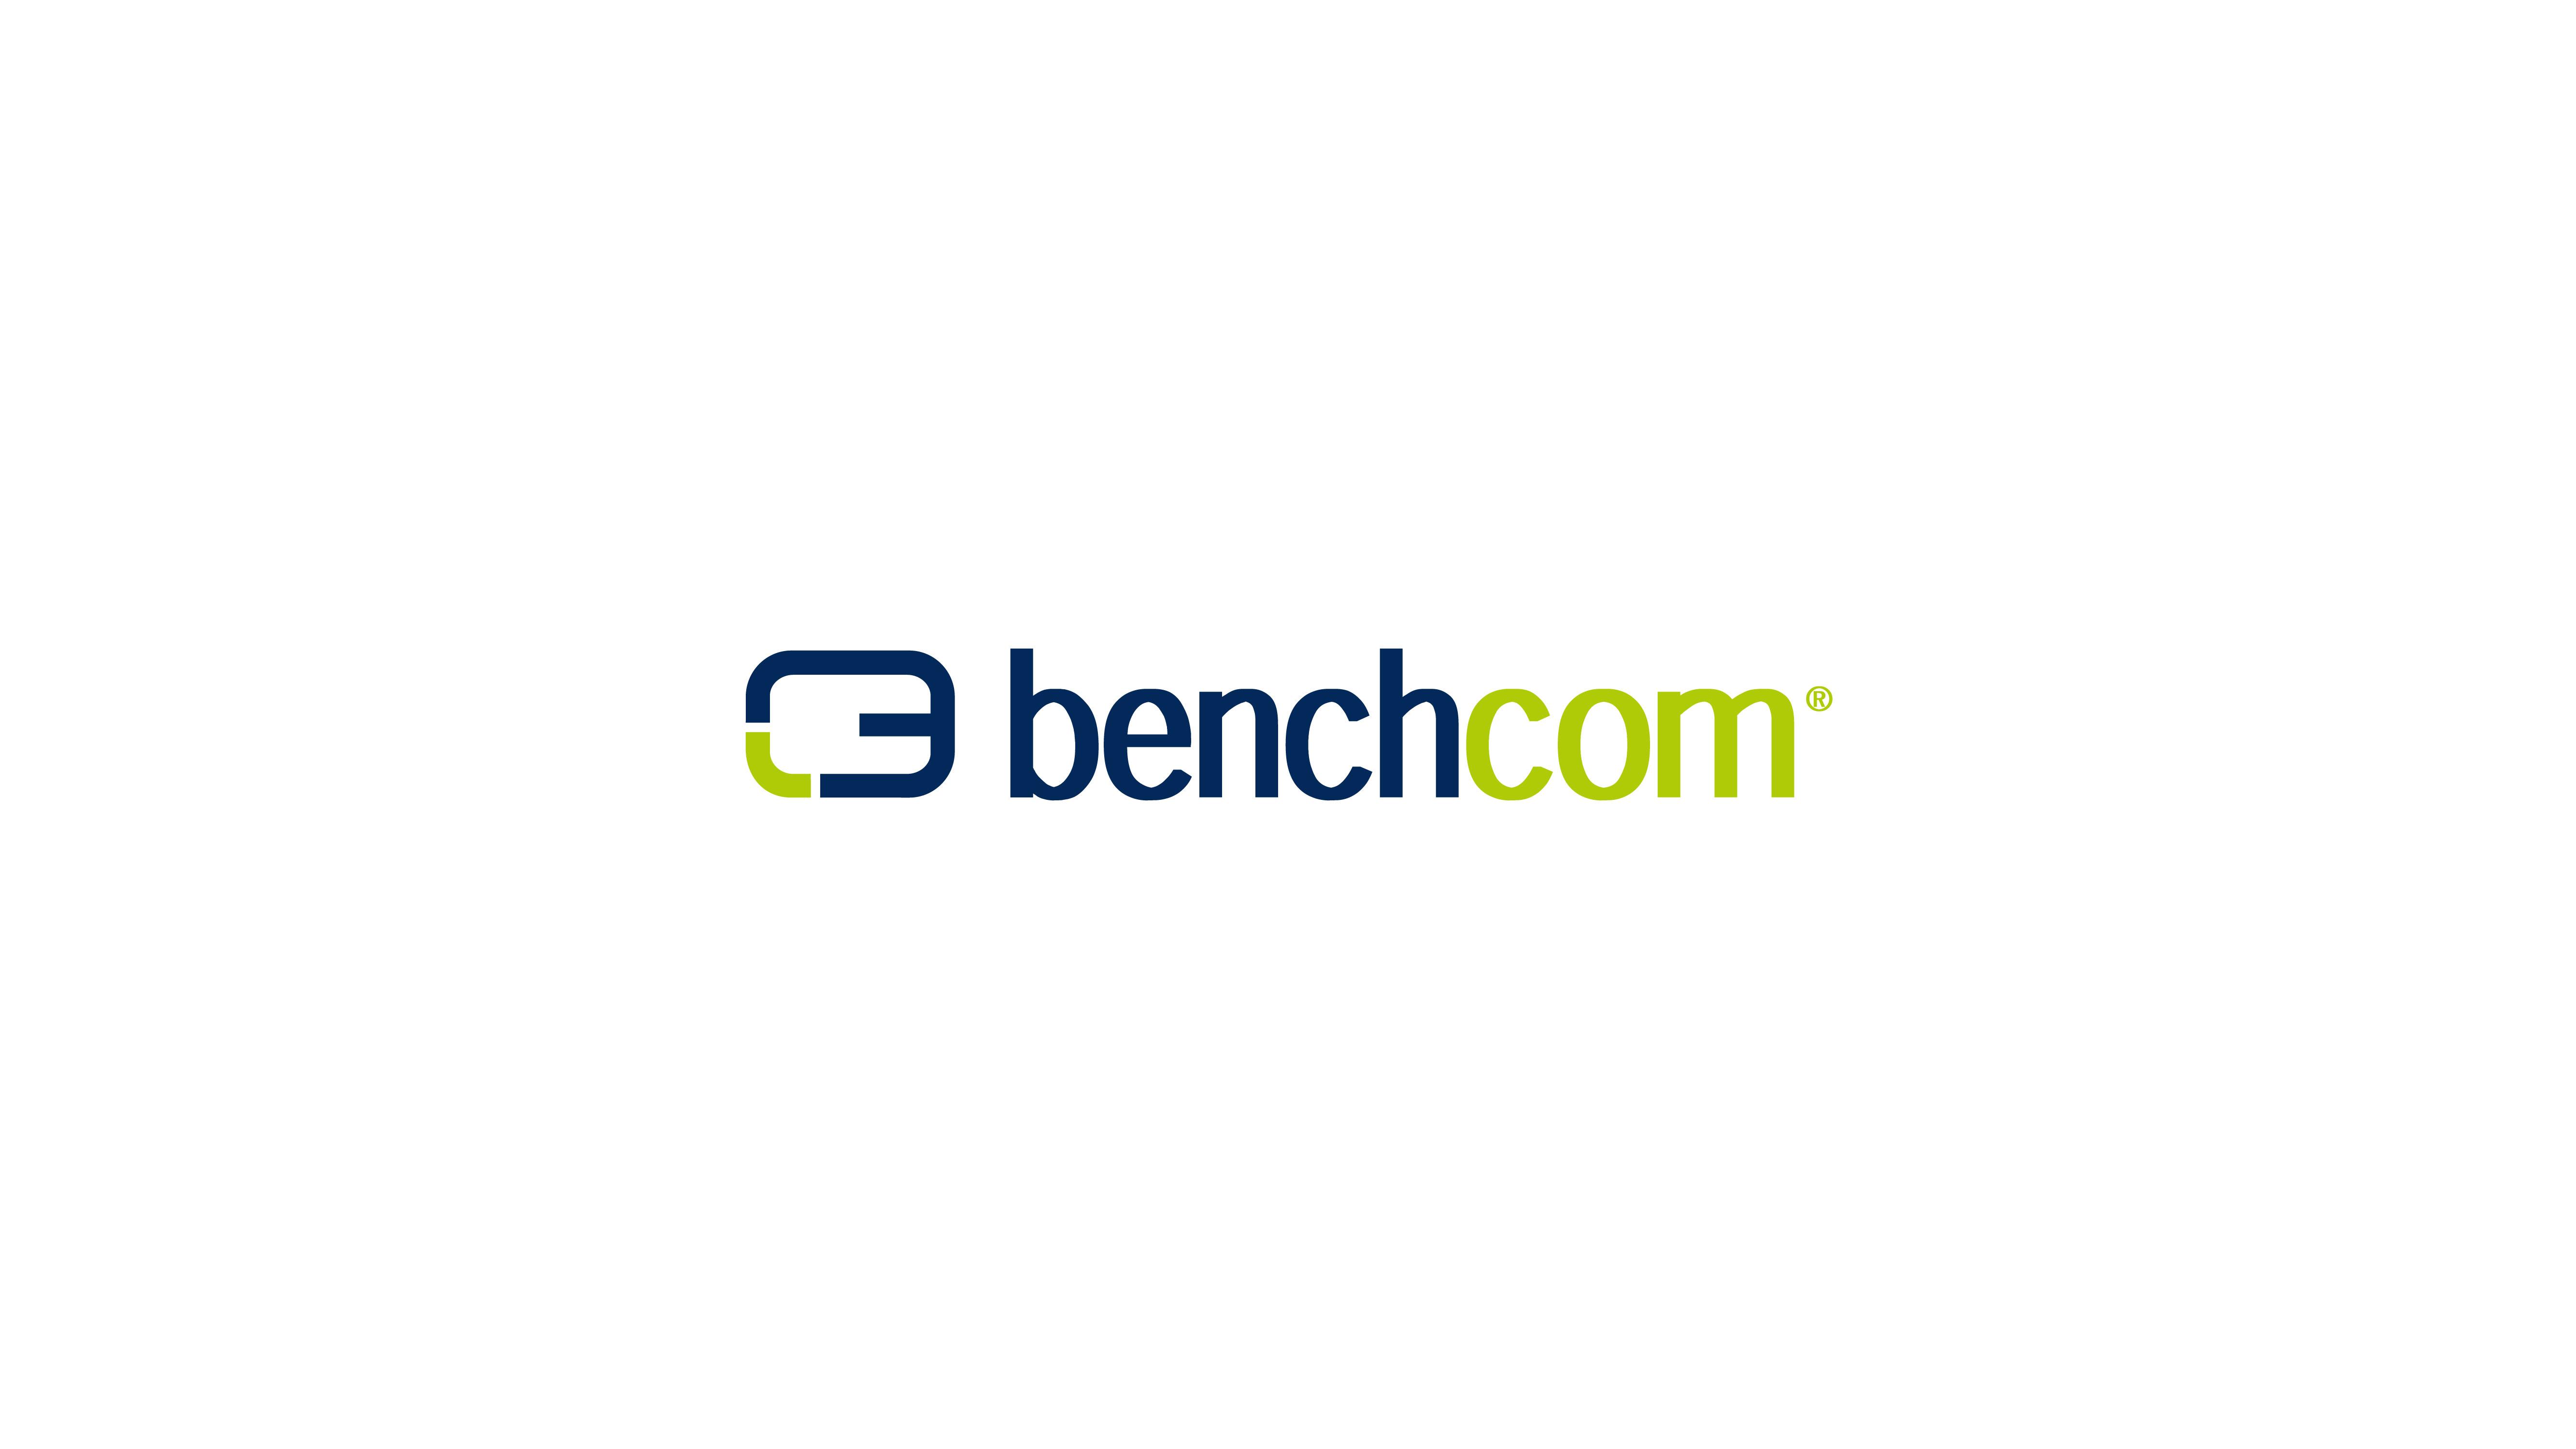 Benchcom_Starscreen-01.jpg